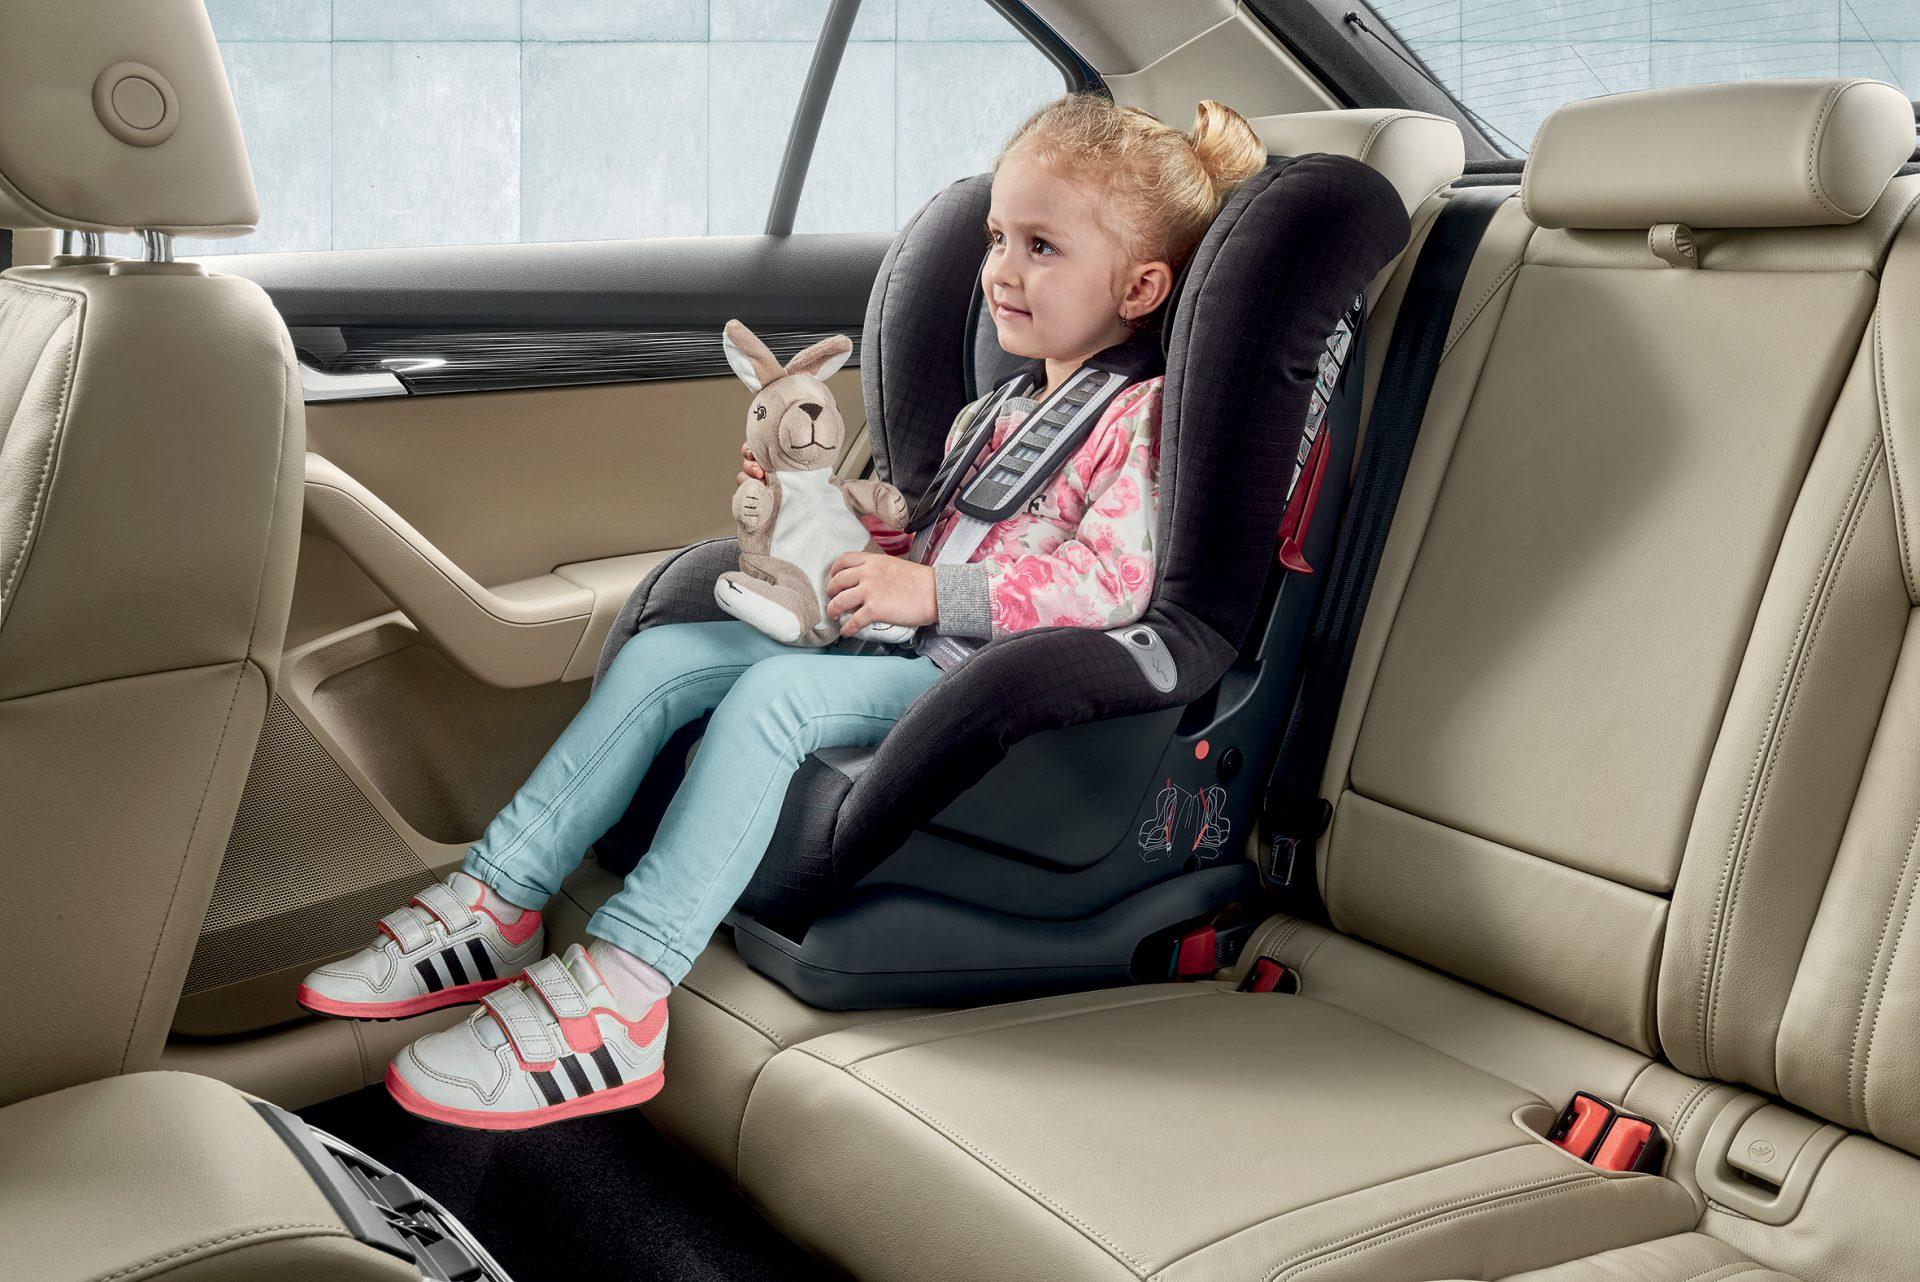 Recomandări privind siguranța copiilor la bord